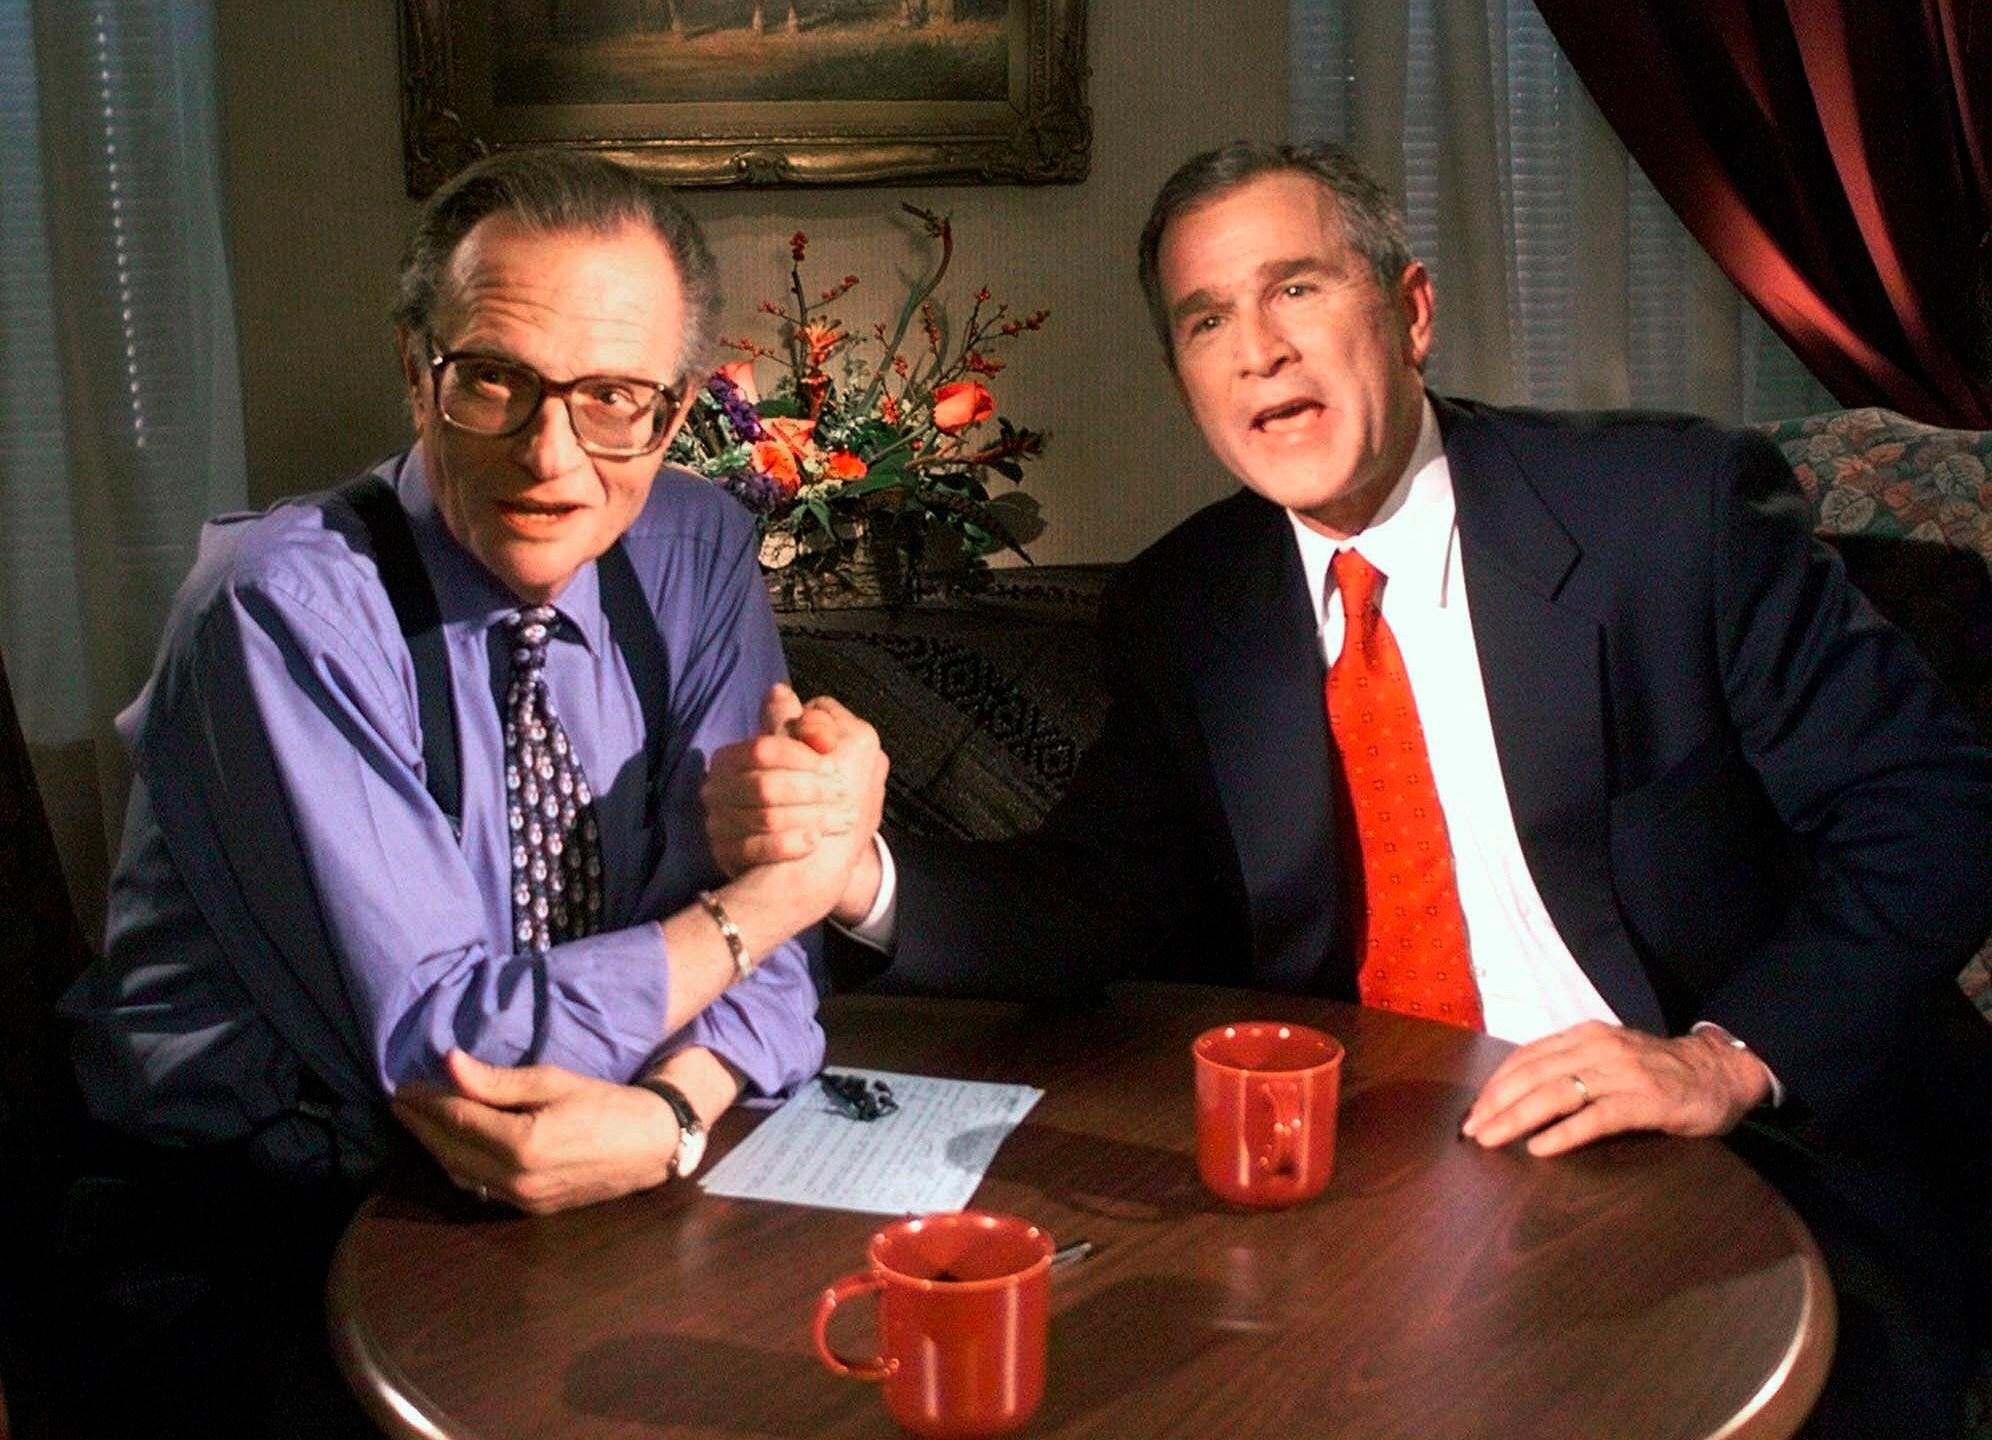 Larry King, George W. Bush